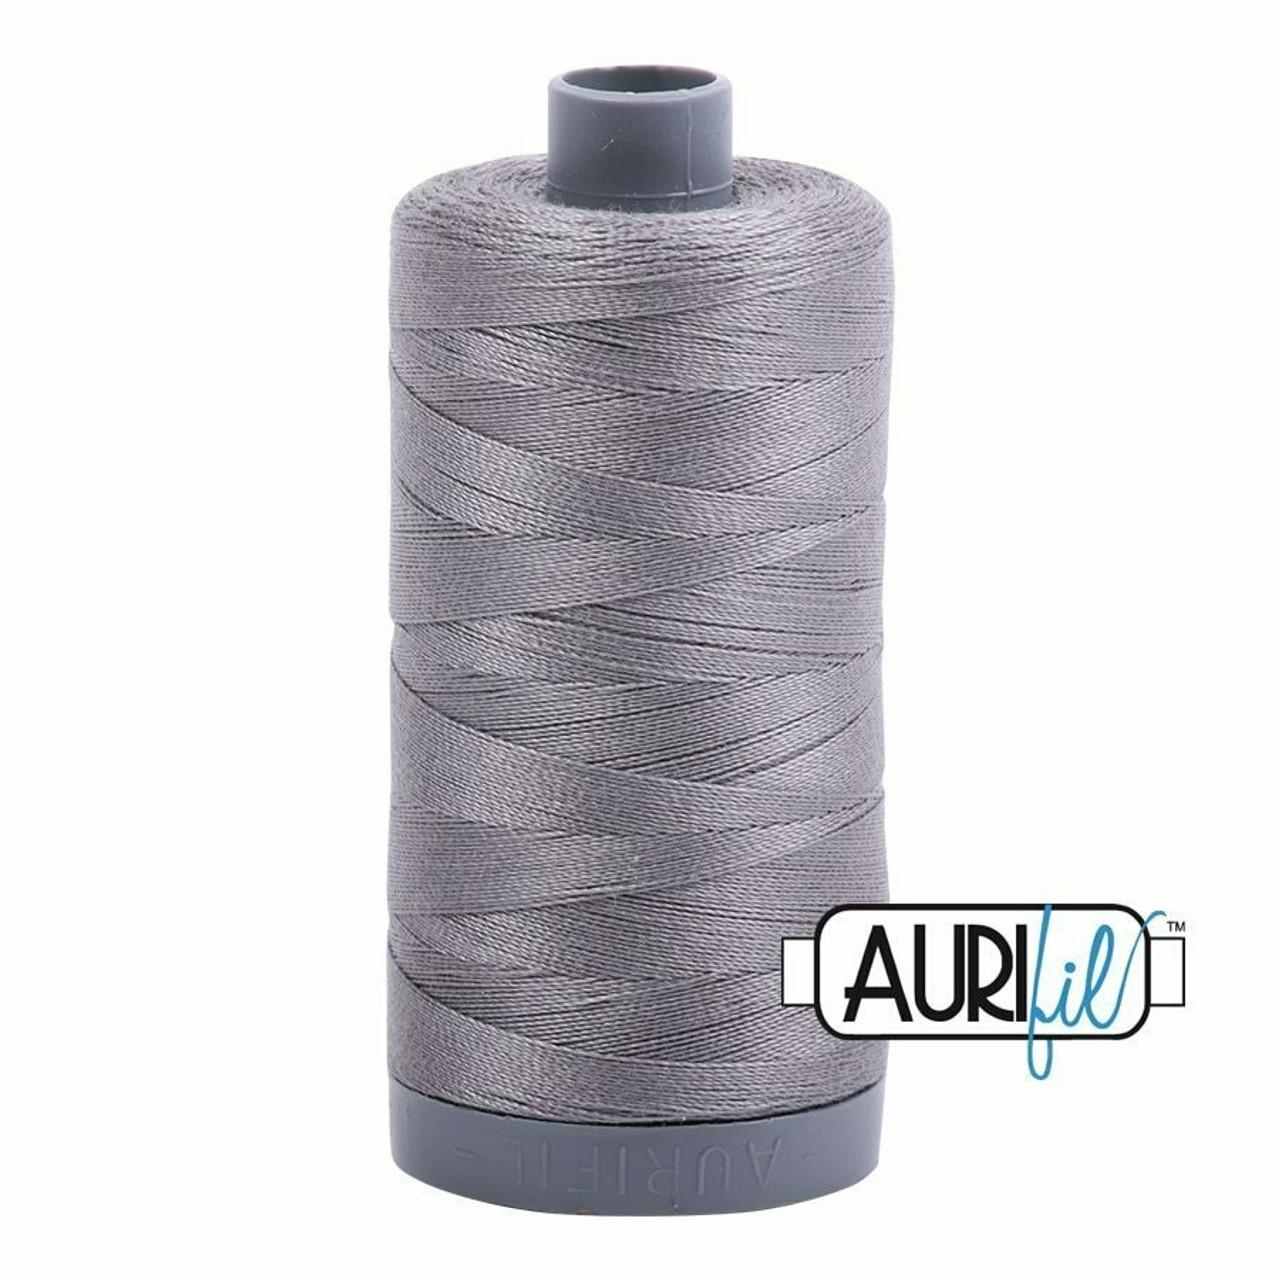 Aurifil 28wt Artic Ice (2625) thread